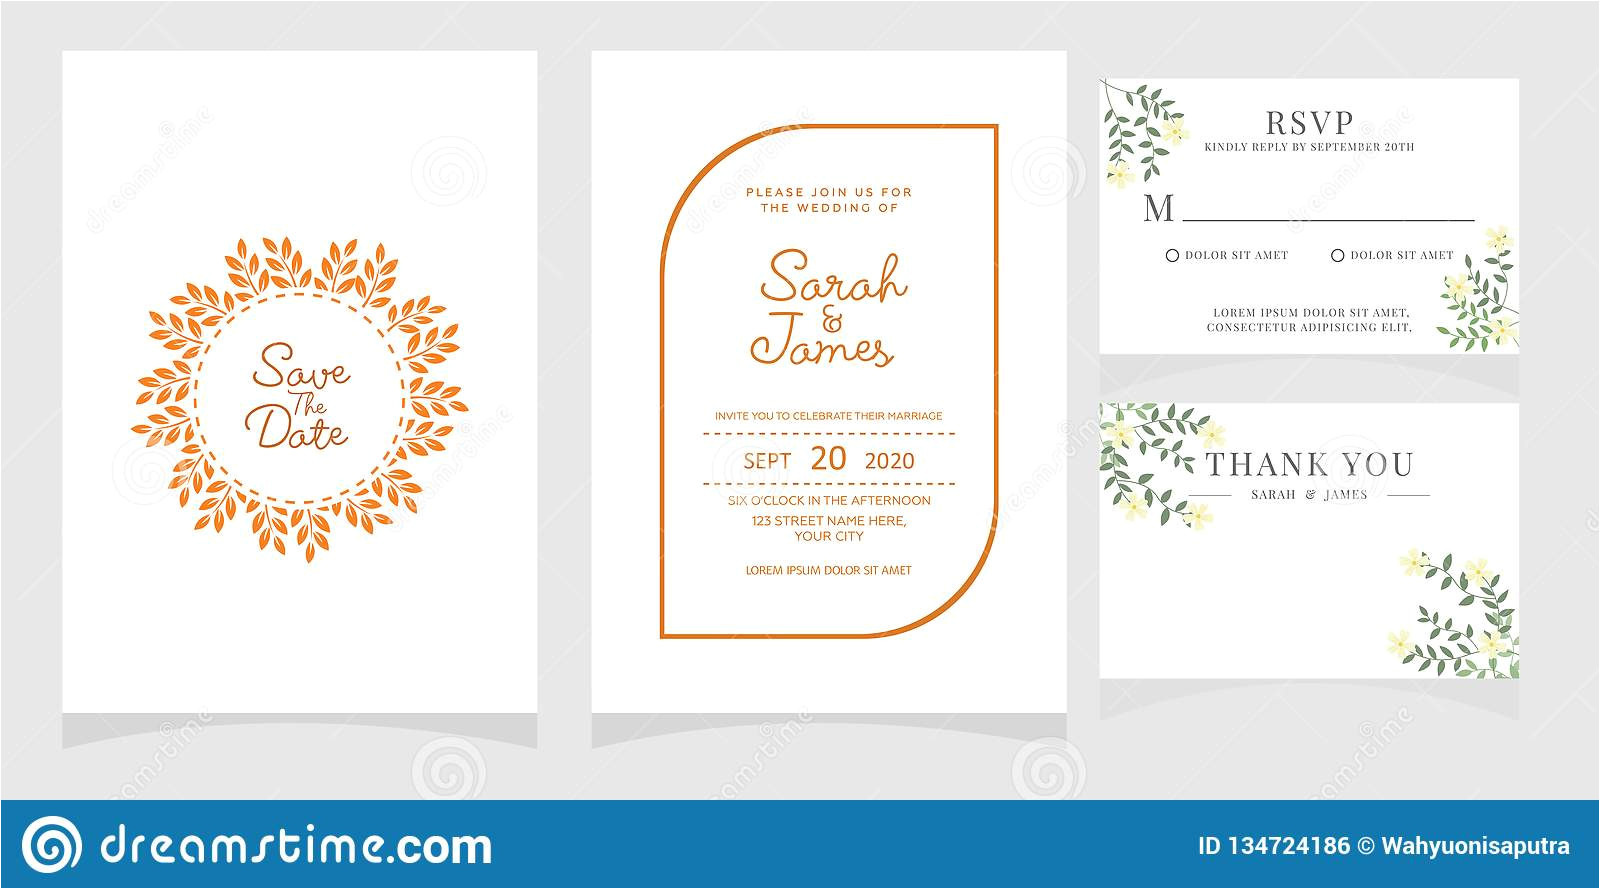 wedding invitation card template copper color flower floral background save date vector illustratio illustration image134724186